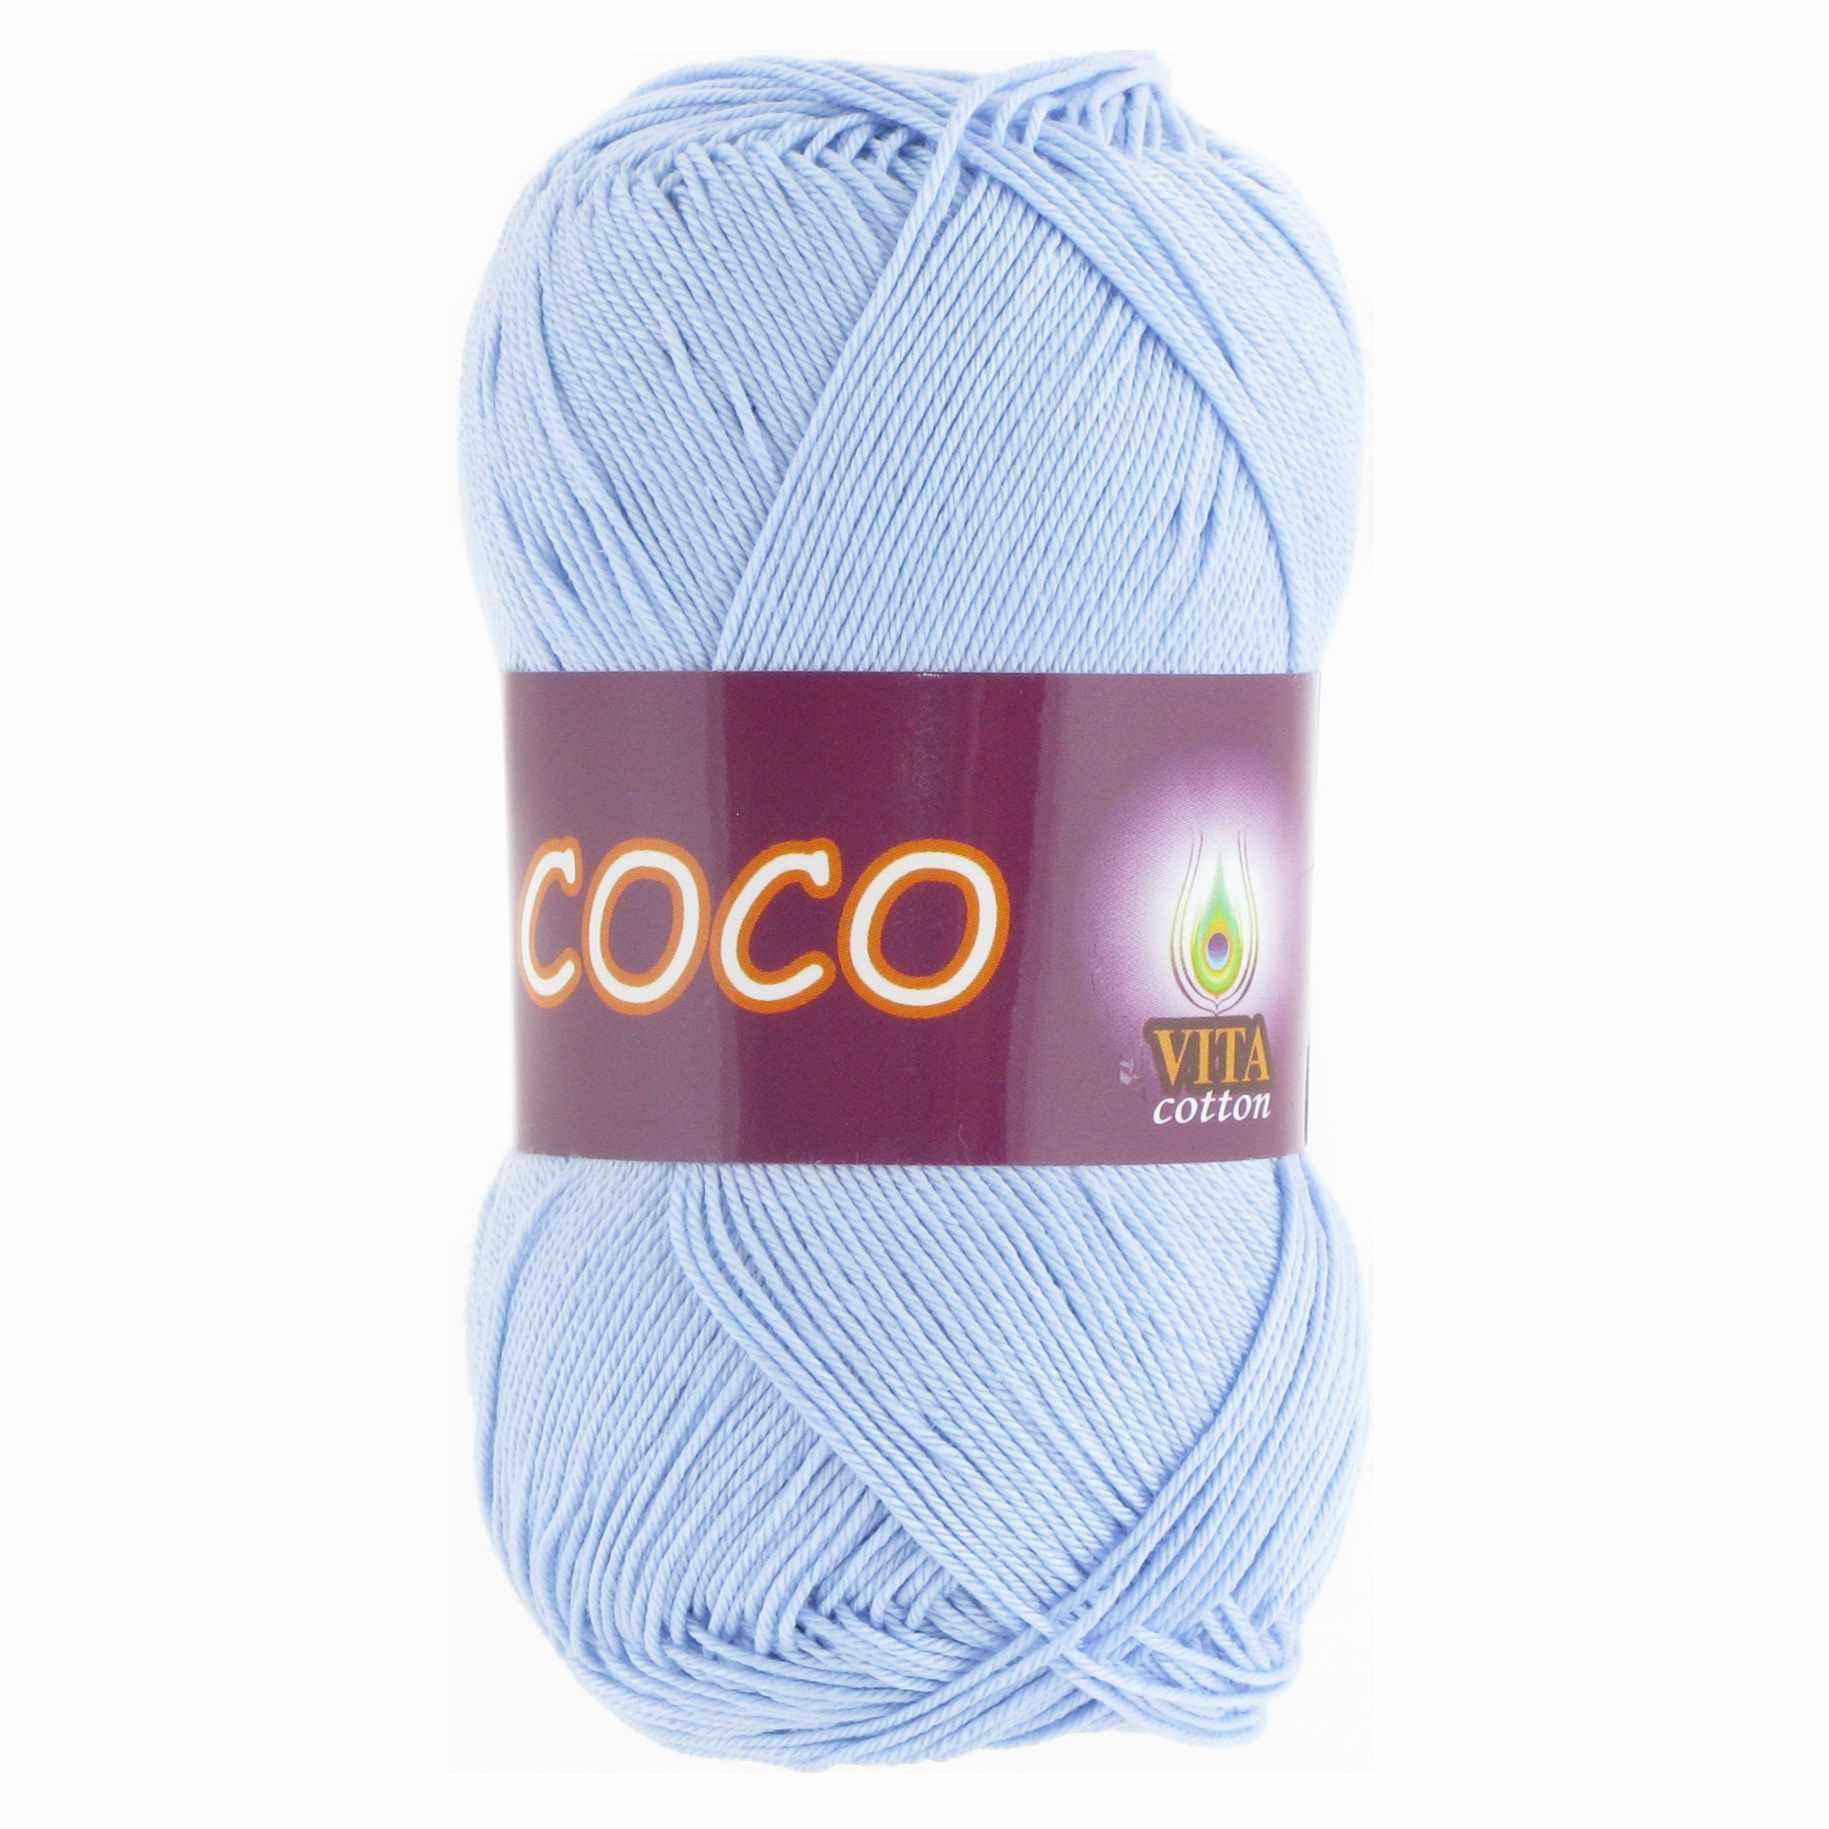 Пряжа VITA Coco Цвет.4323 Светло-голубой